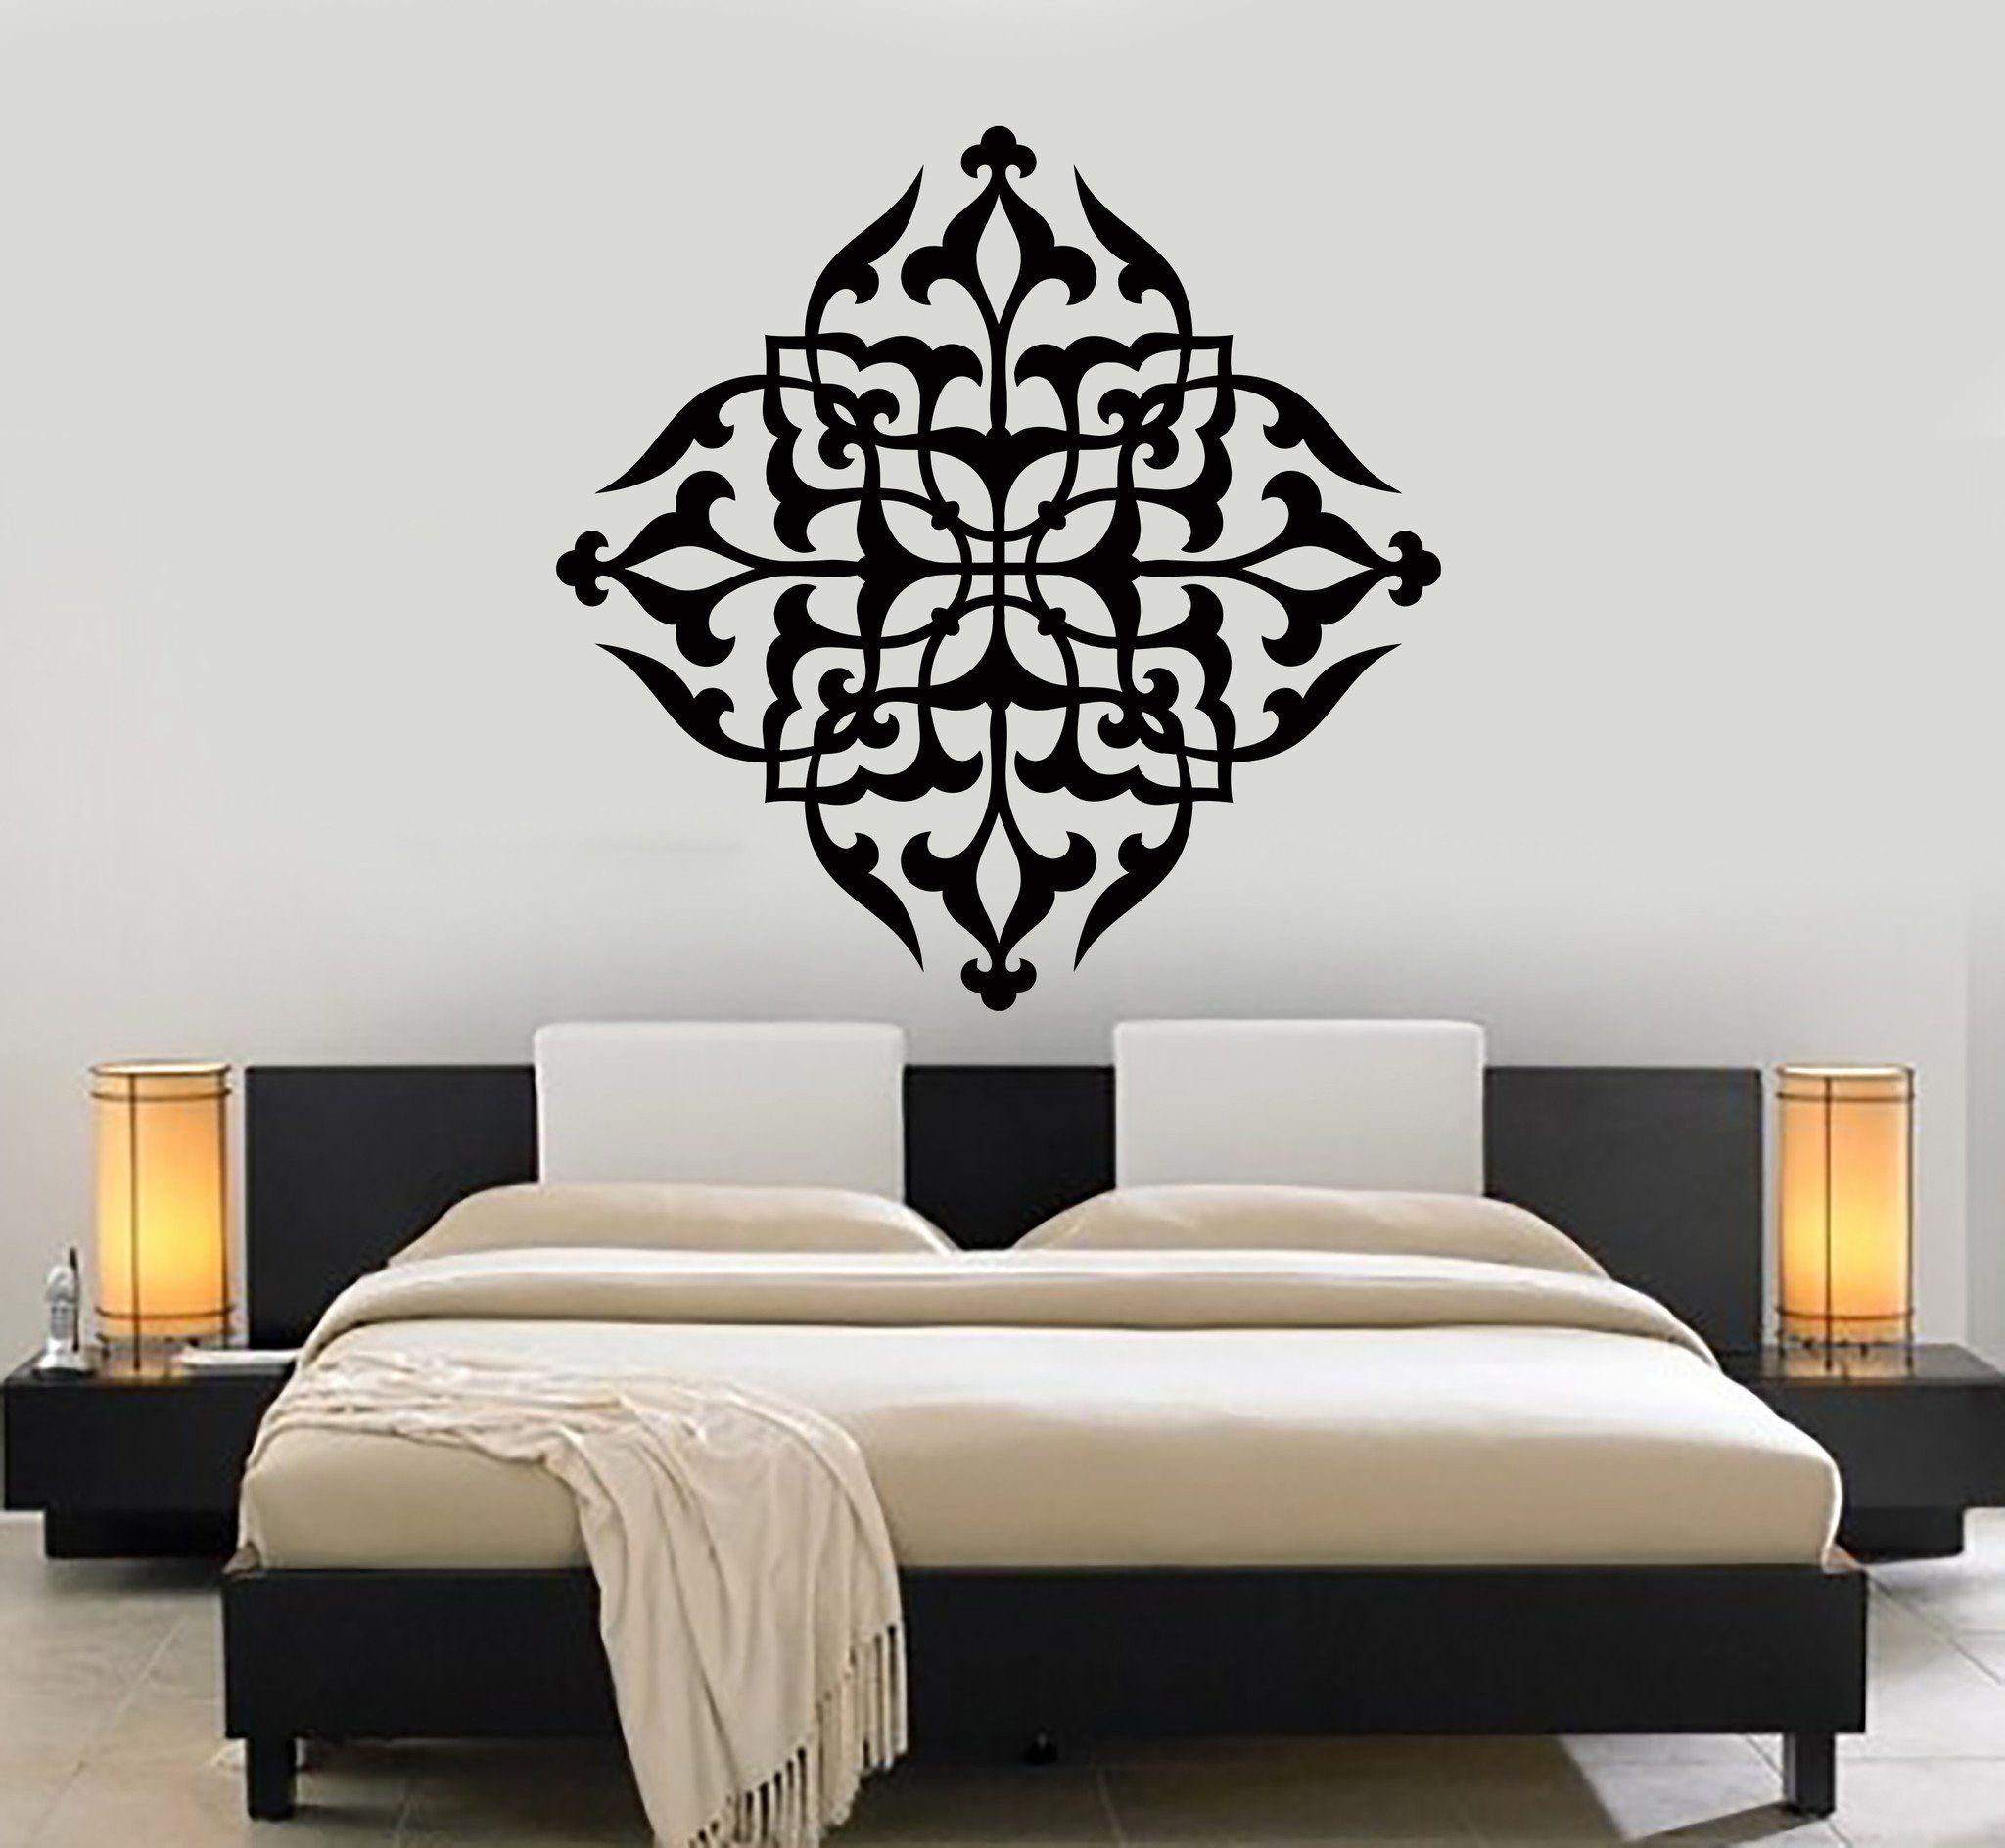 Wall Decal Mandala Yoga Meditation Buddha Bedroom Decor Unique Gift